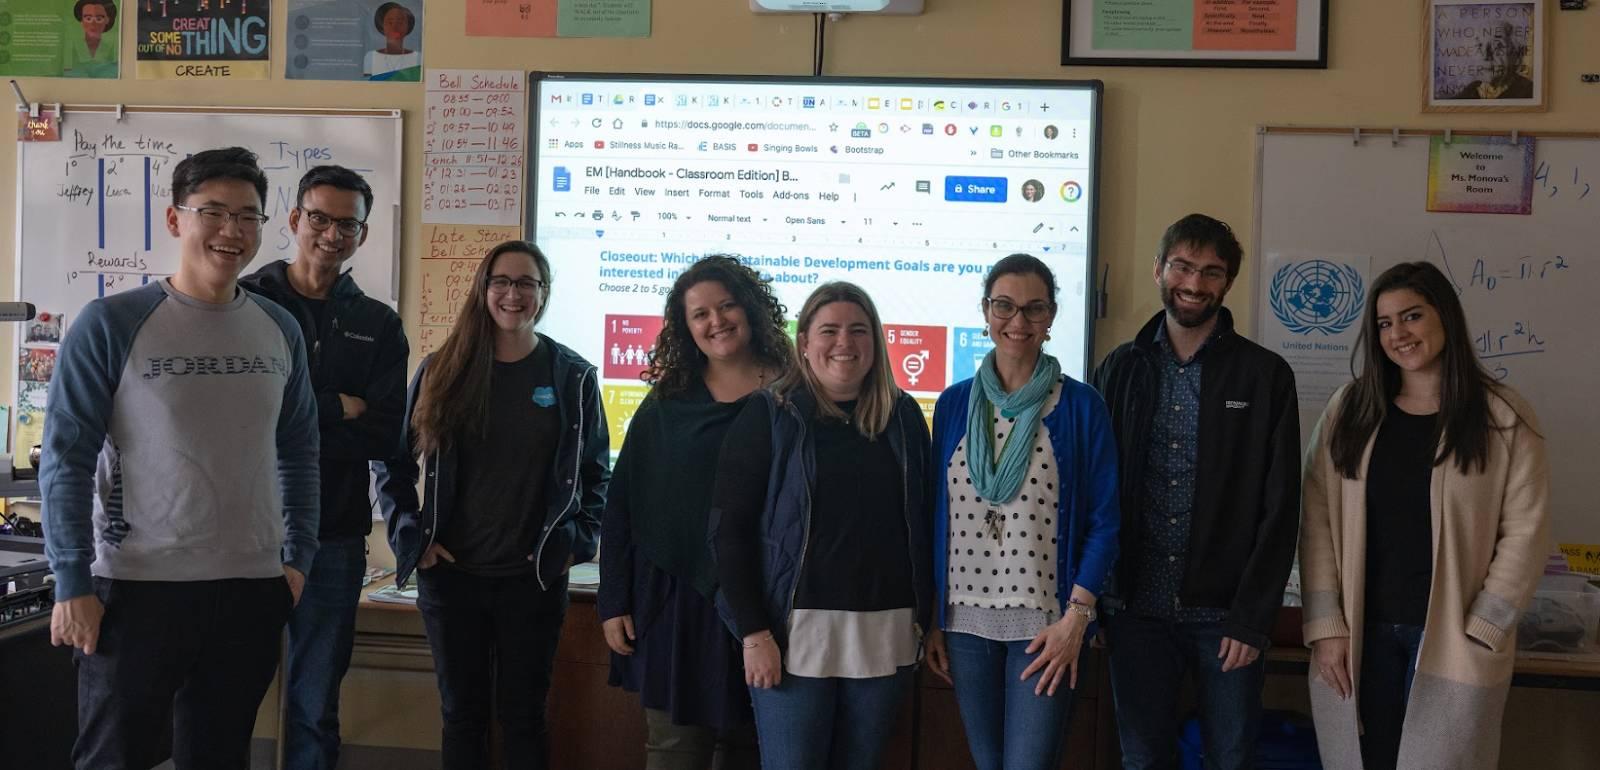 Francisco Middle School (SFUSD) の Monova 教師と活躍したボランティア